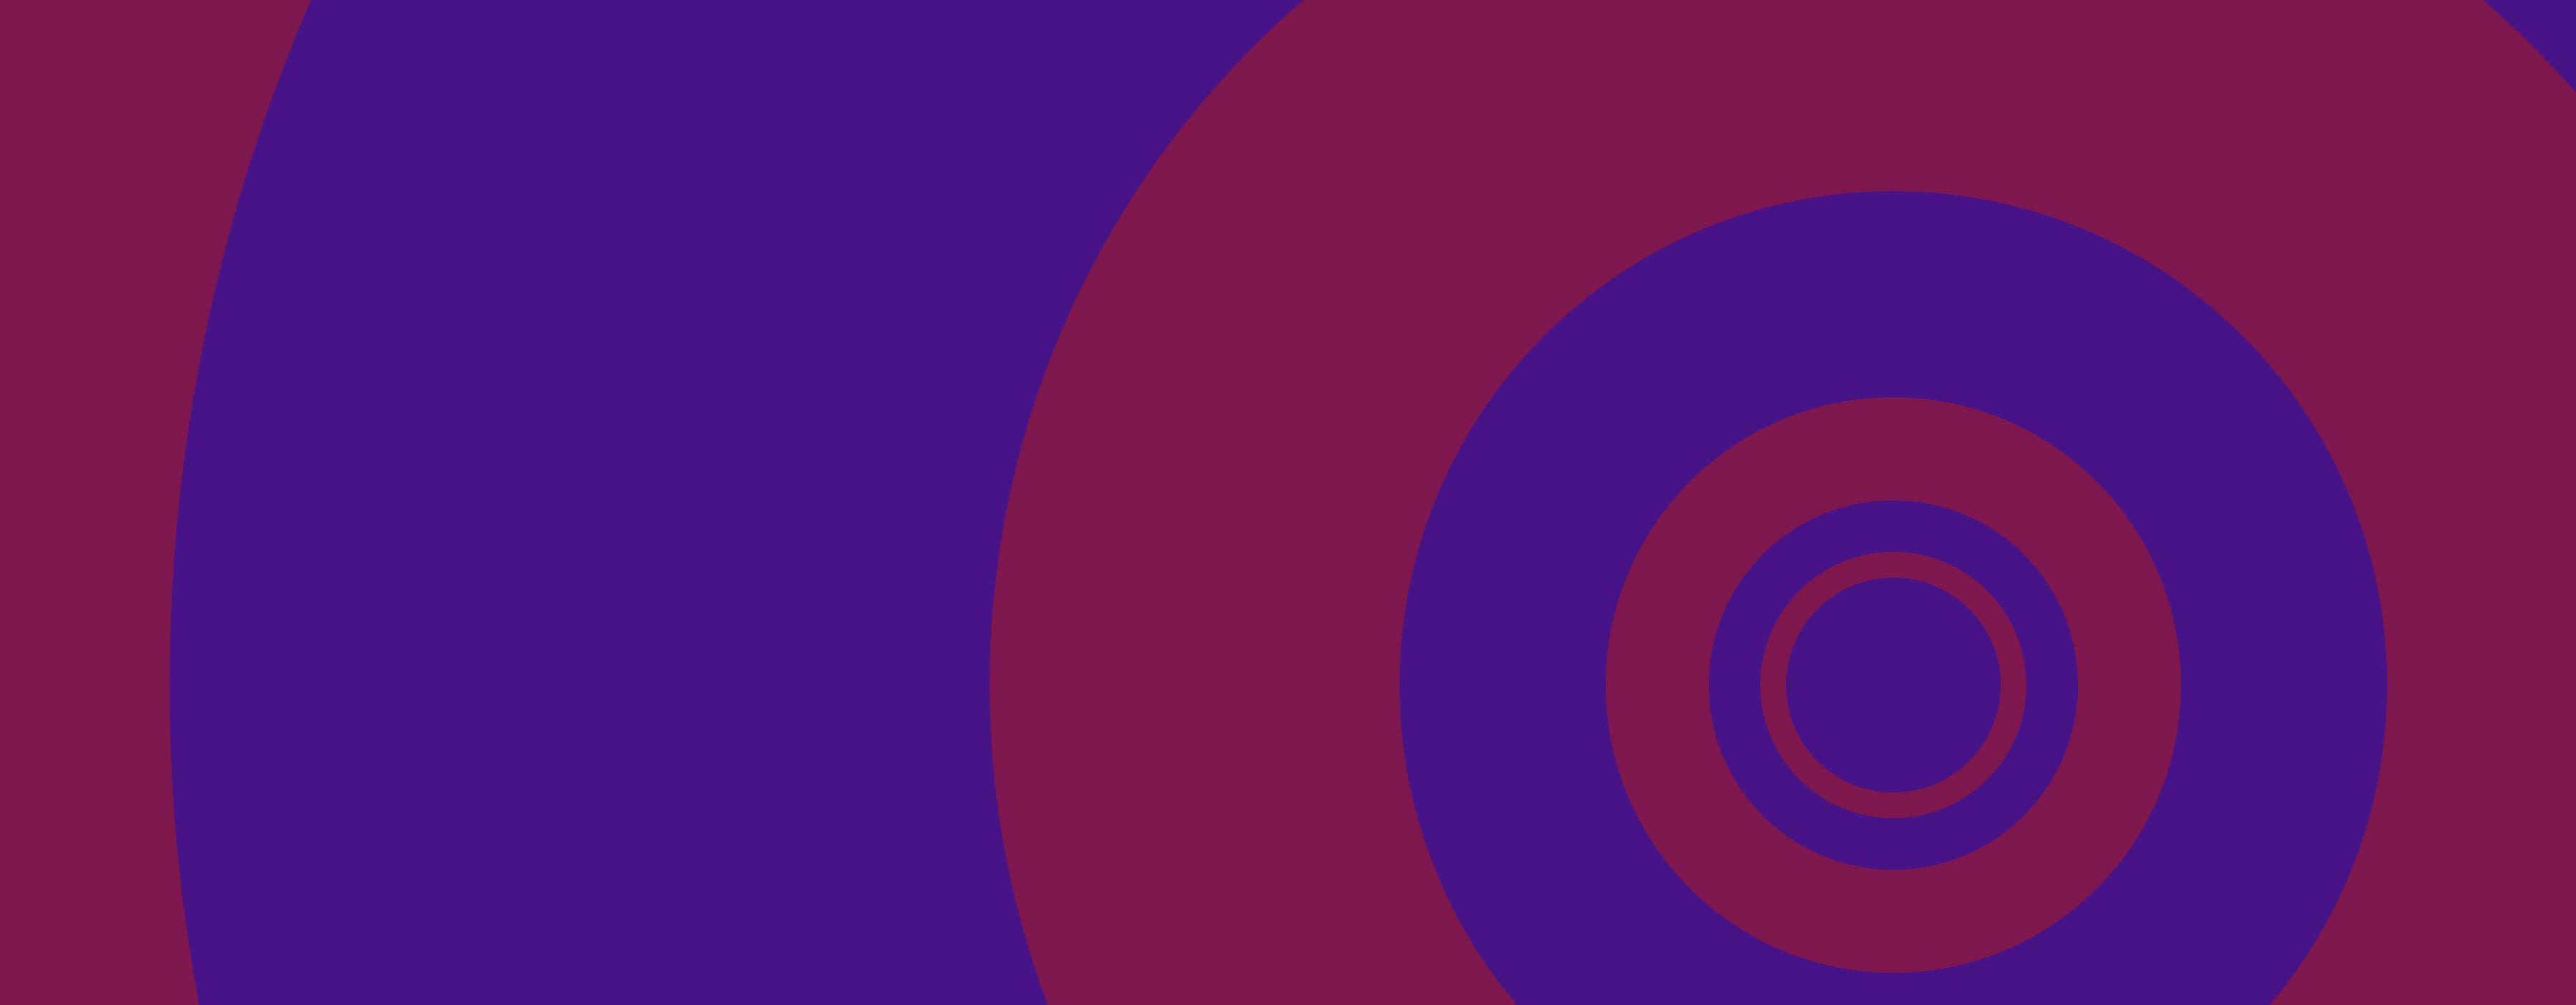 A diagram of concentric circles